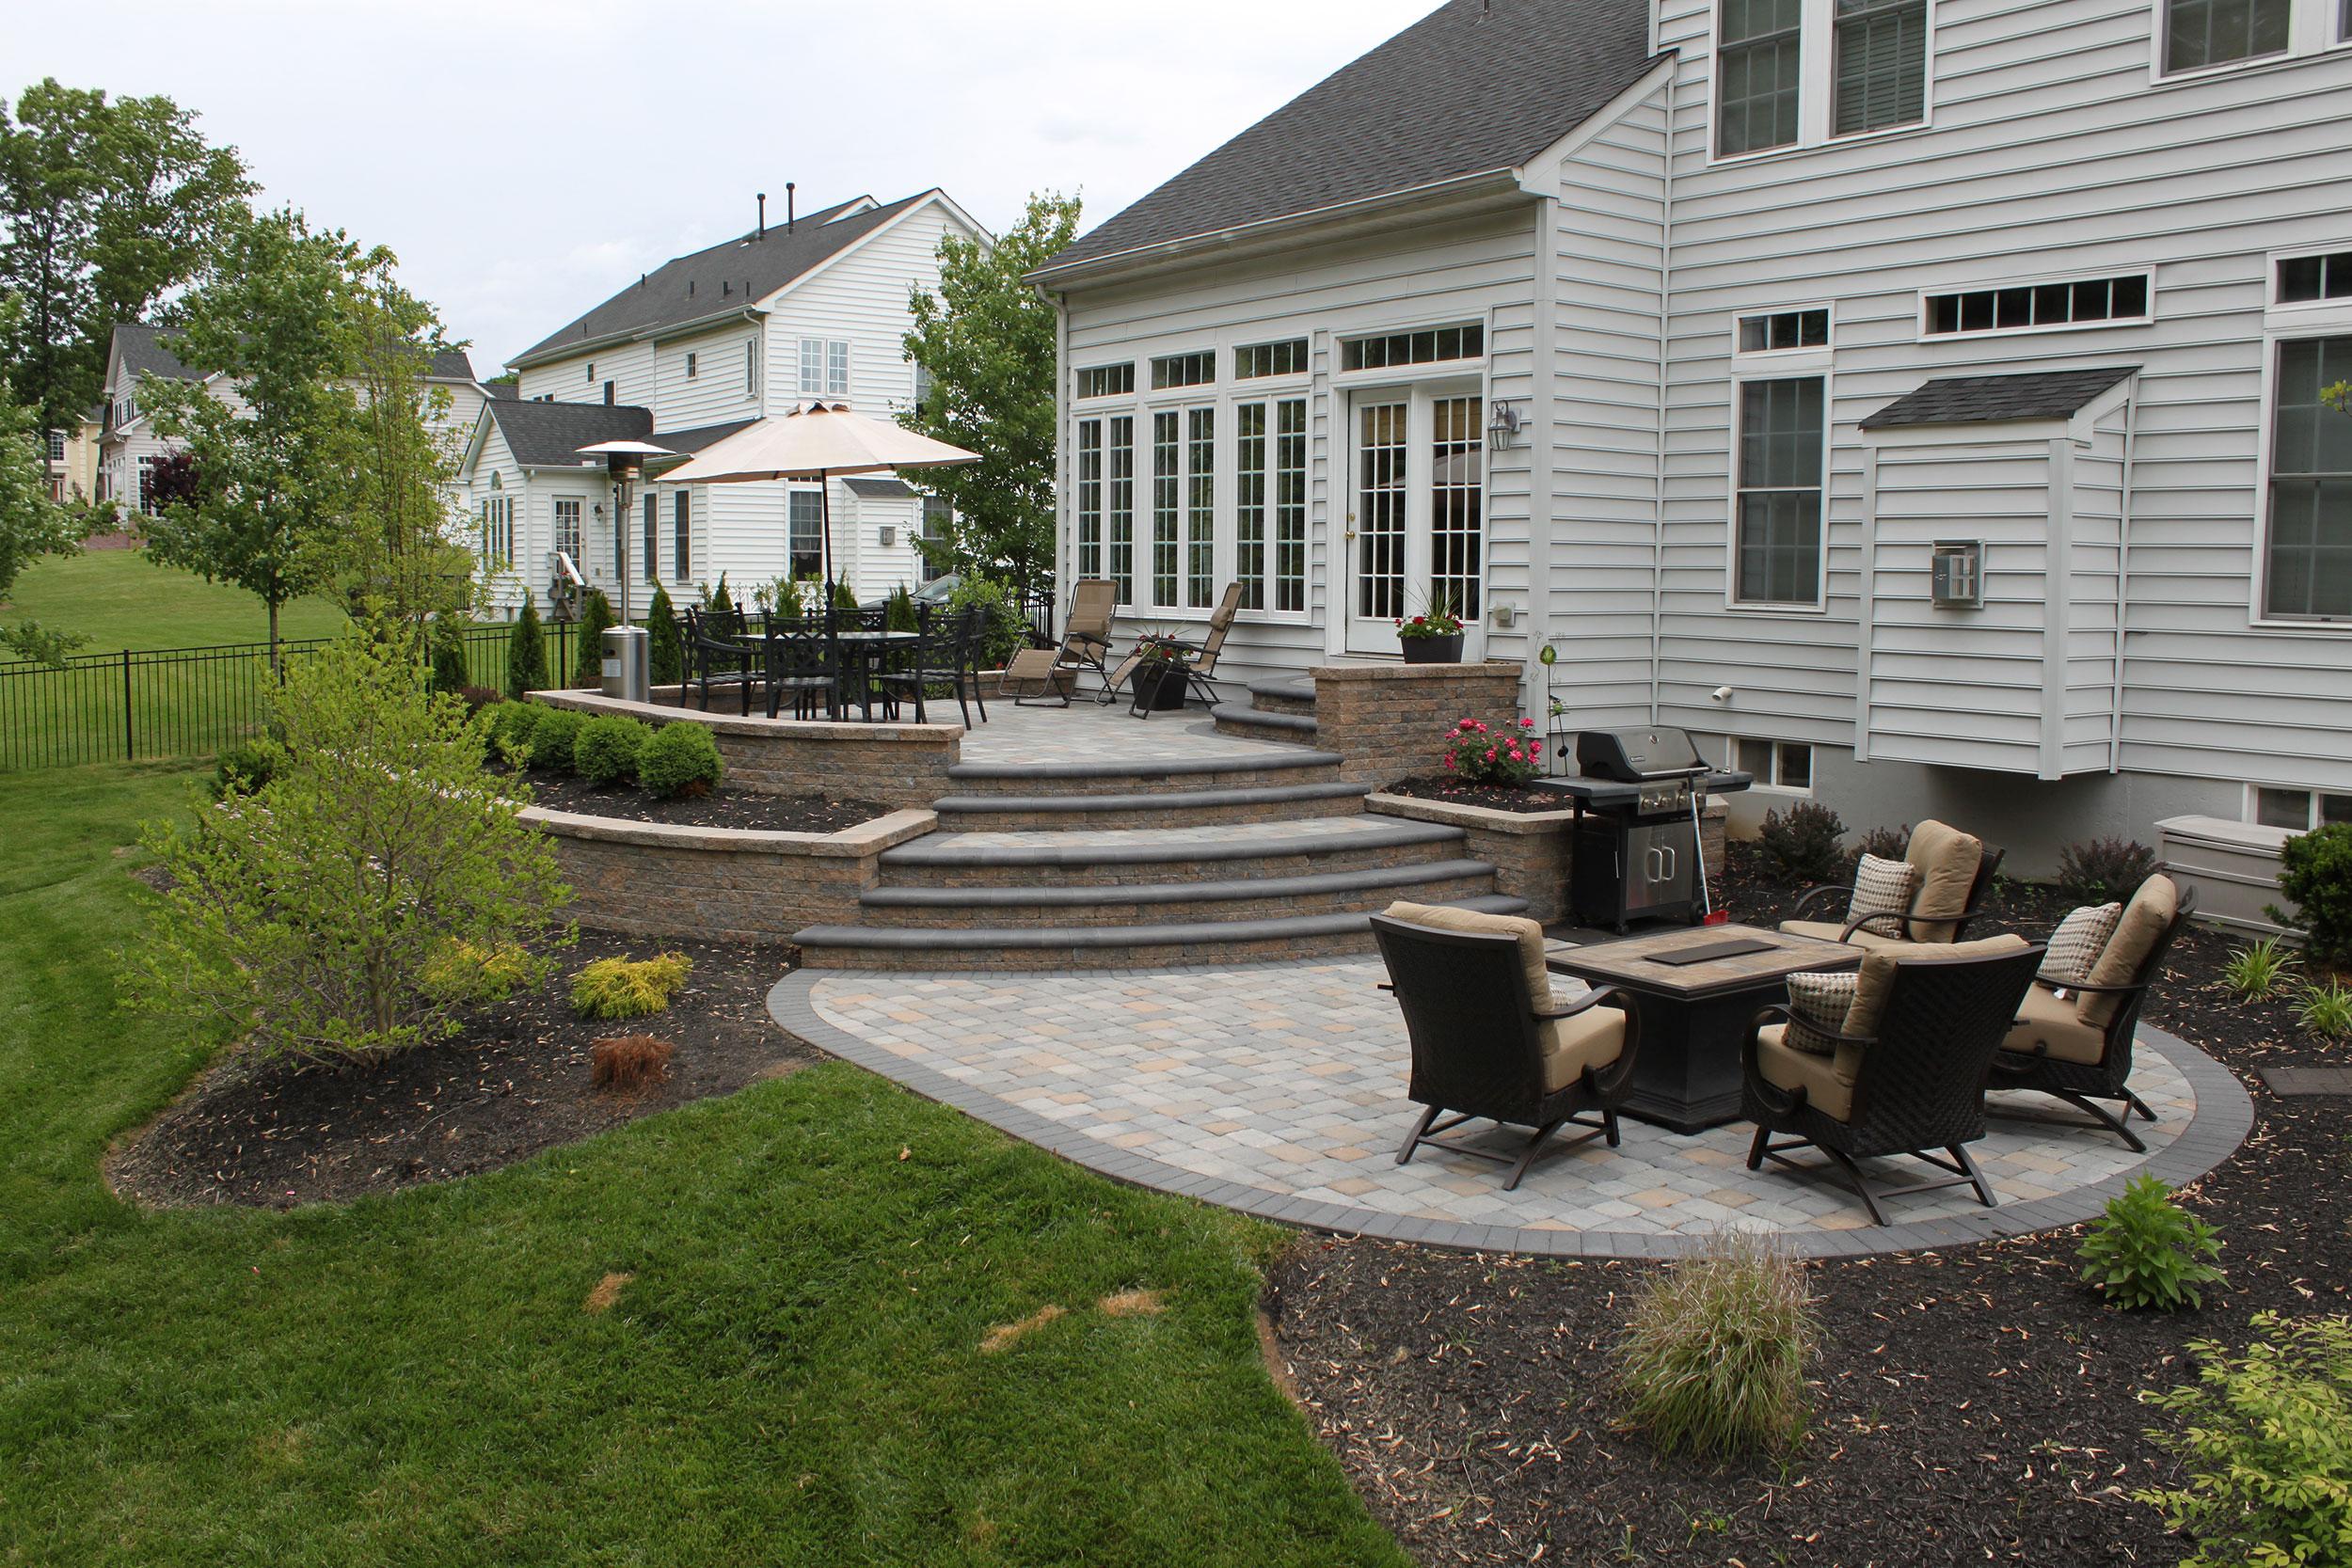 Doylestown Raised Patio | R&R Caddick Landscape Design on Raised Patio Designs  id=25486